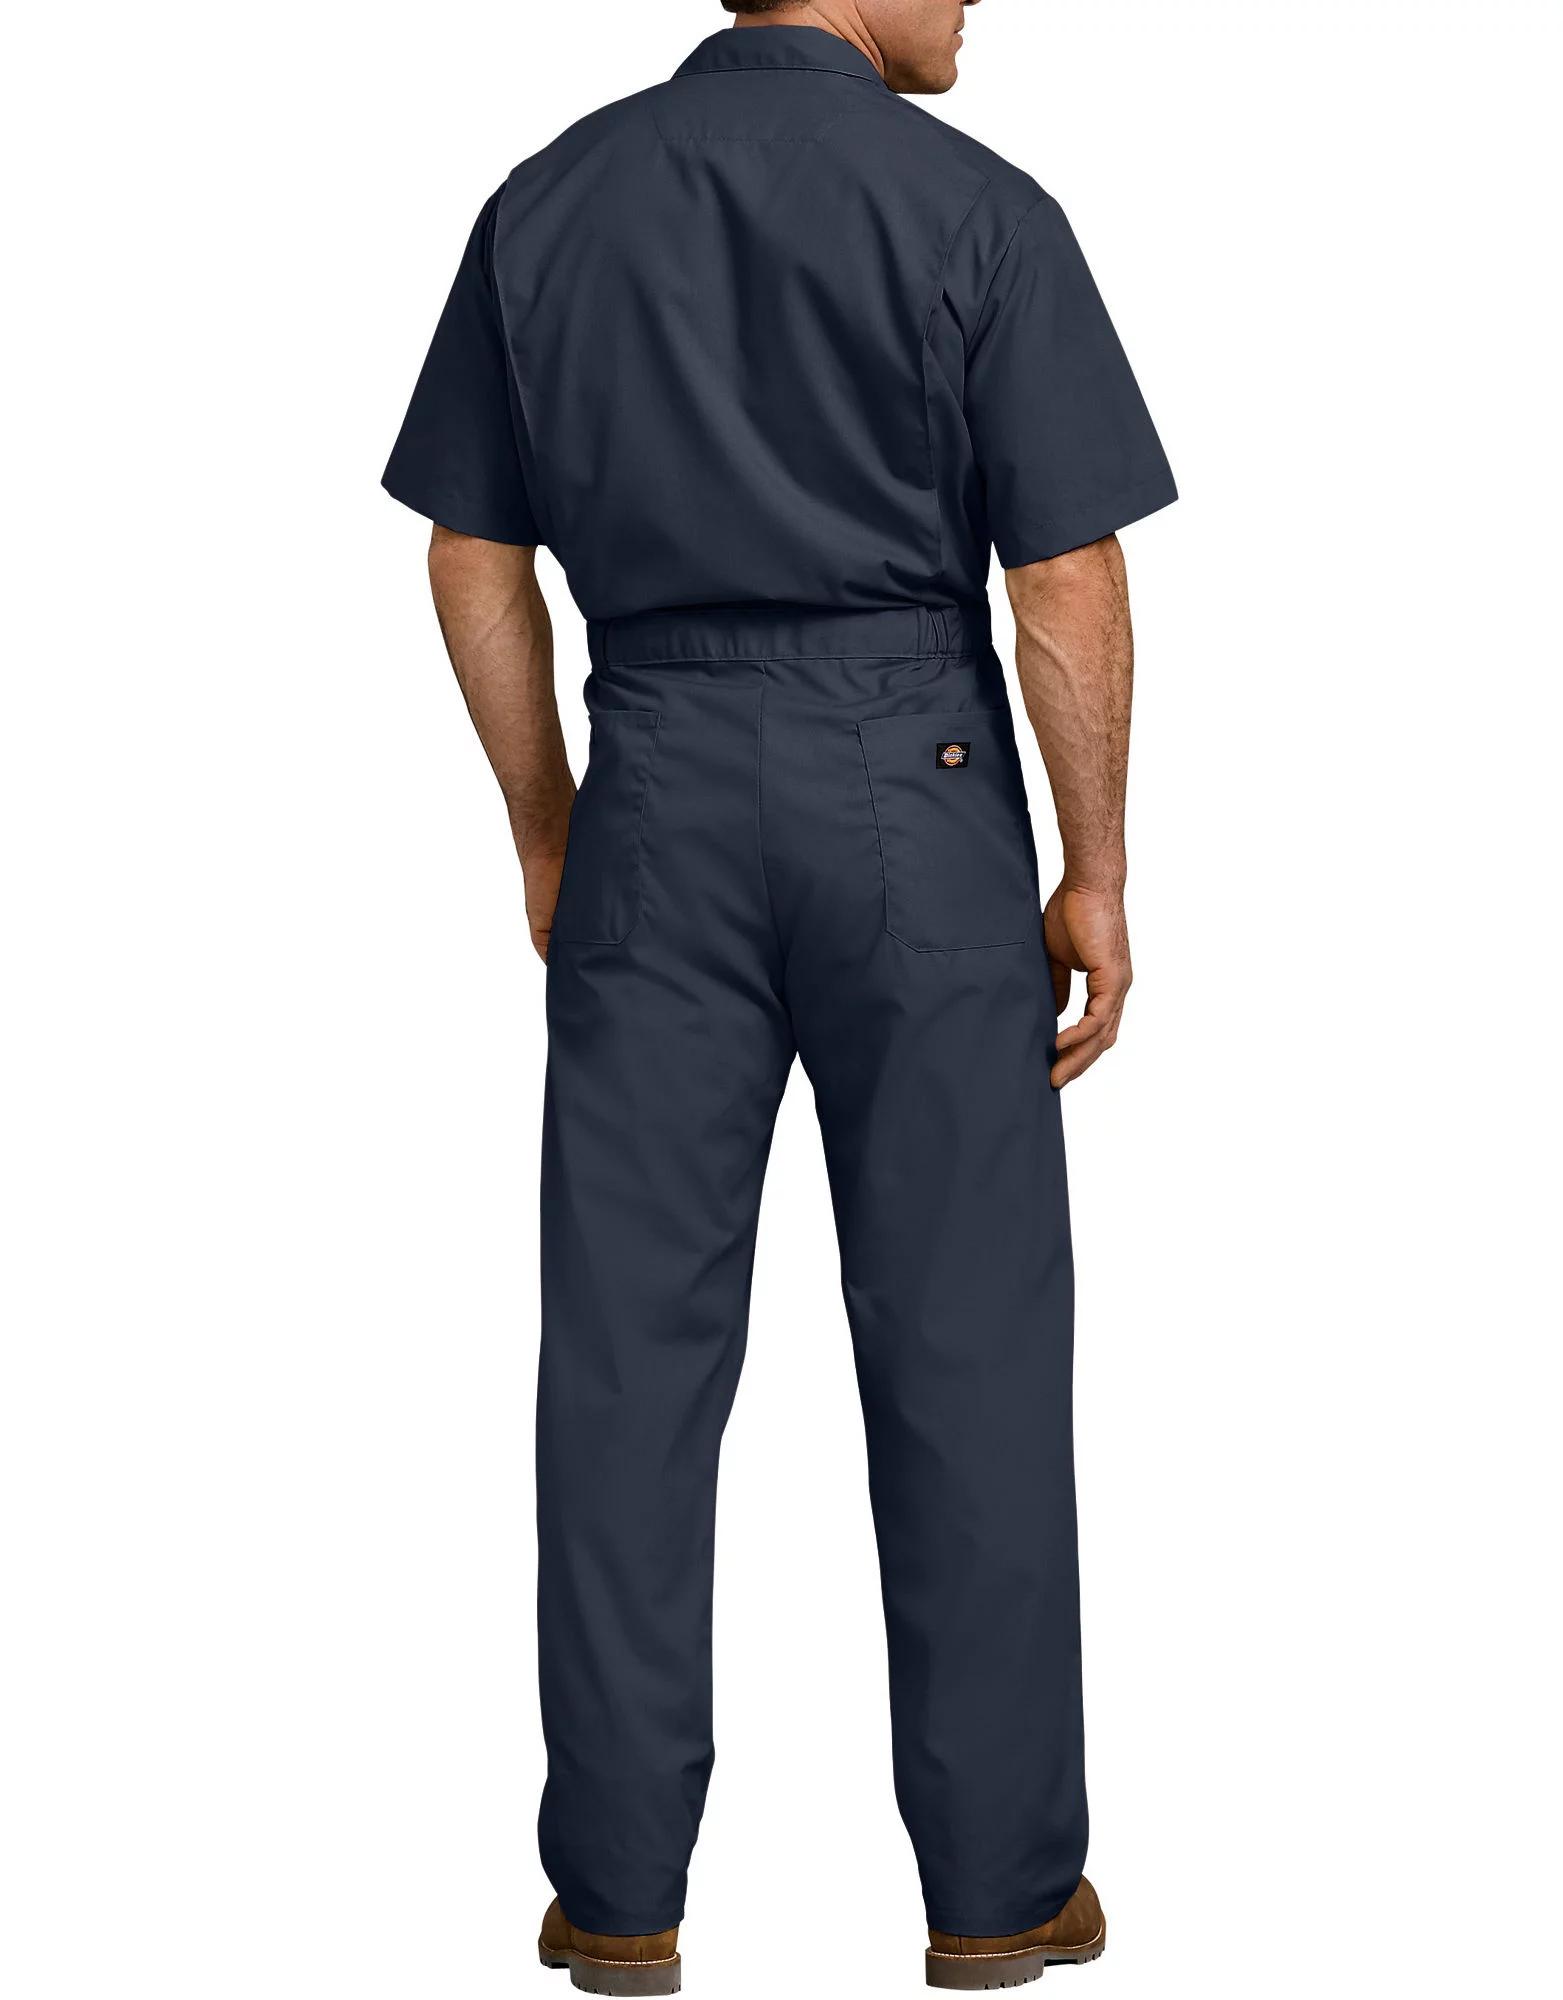 Dickies-Men-039-s-Short-Sleeve-Coveralls-Elastic-Waist-Work-Wear-Uniform thumbnail 5